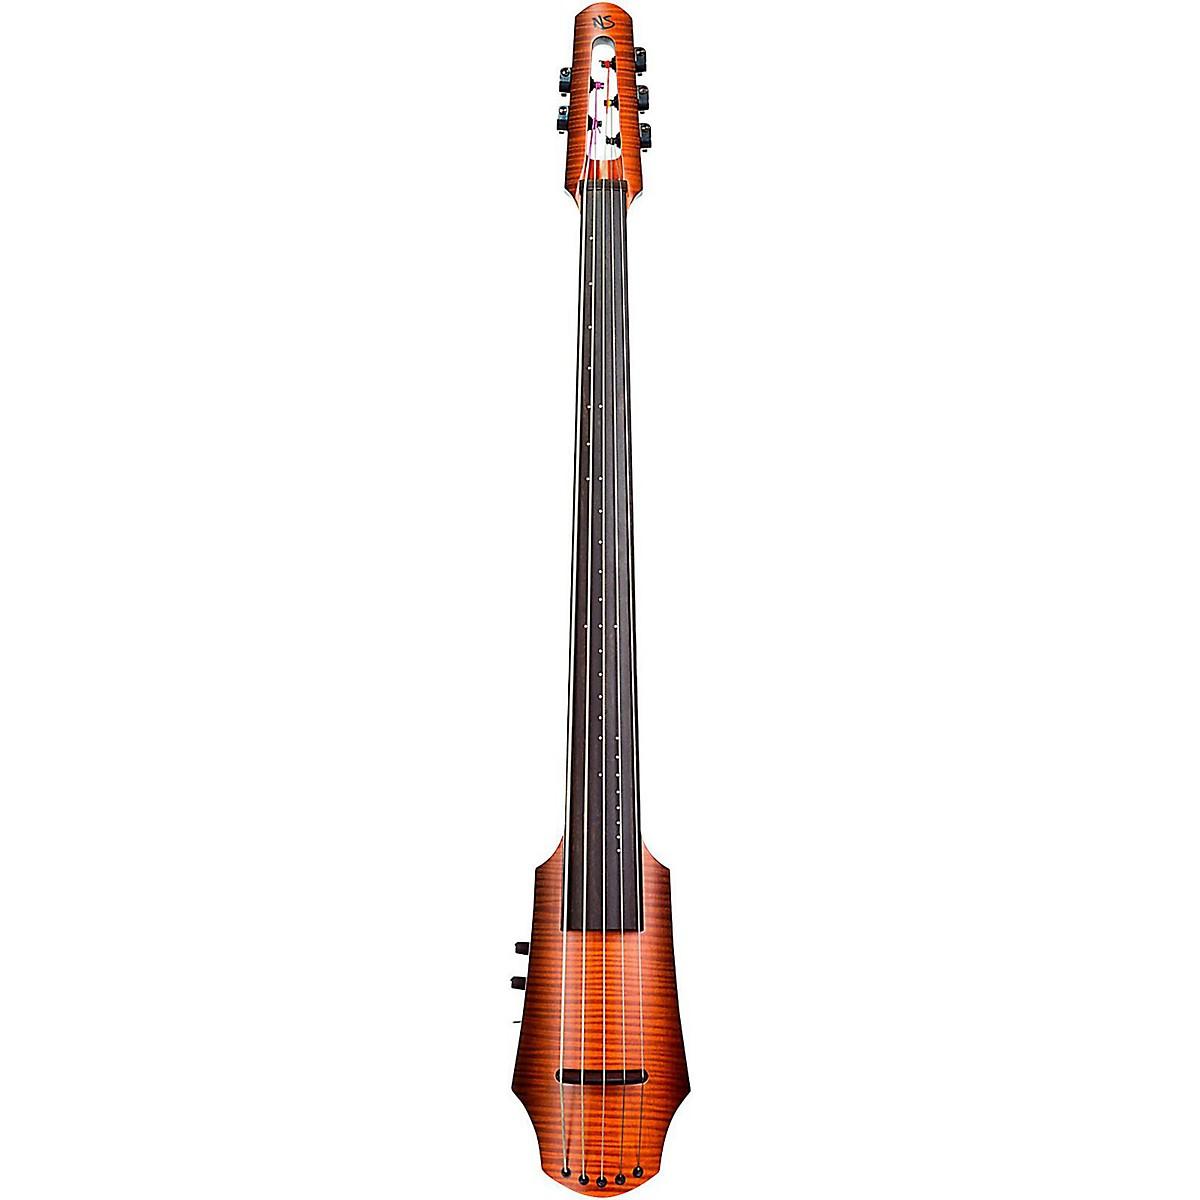 NS Design NXTa Active Series 5-String Electric Cello in Sunburst